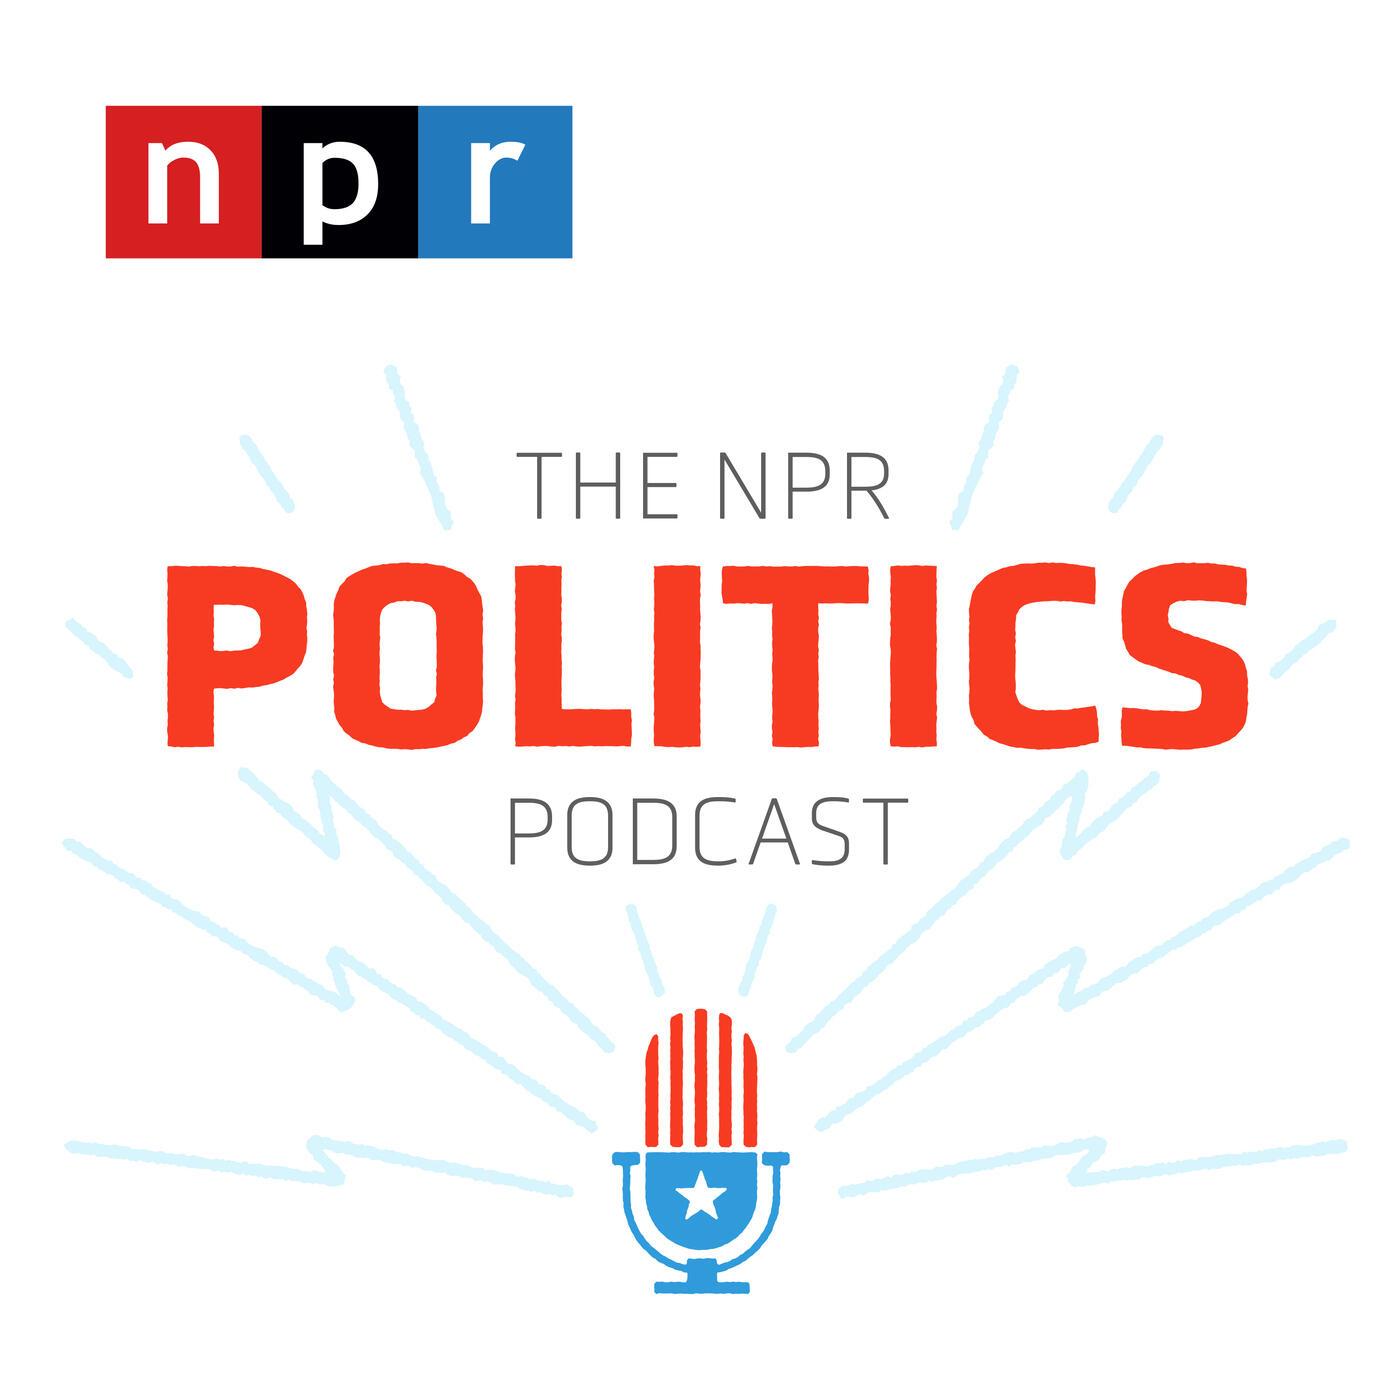 Listen to NPR Politics Live From Philadelphia: The Road To 2020 | NPR Politics Podcast | Podcasts